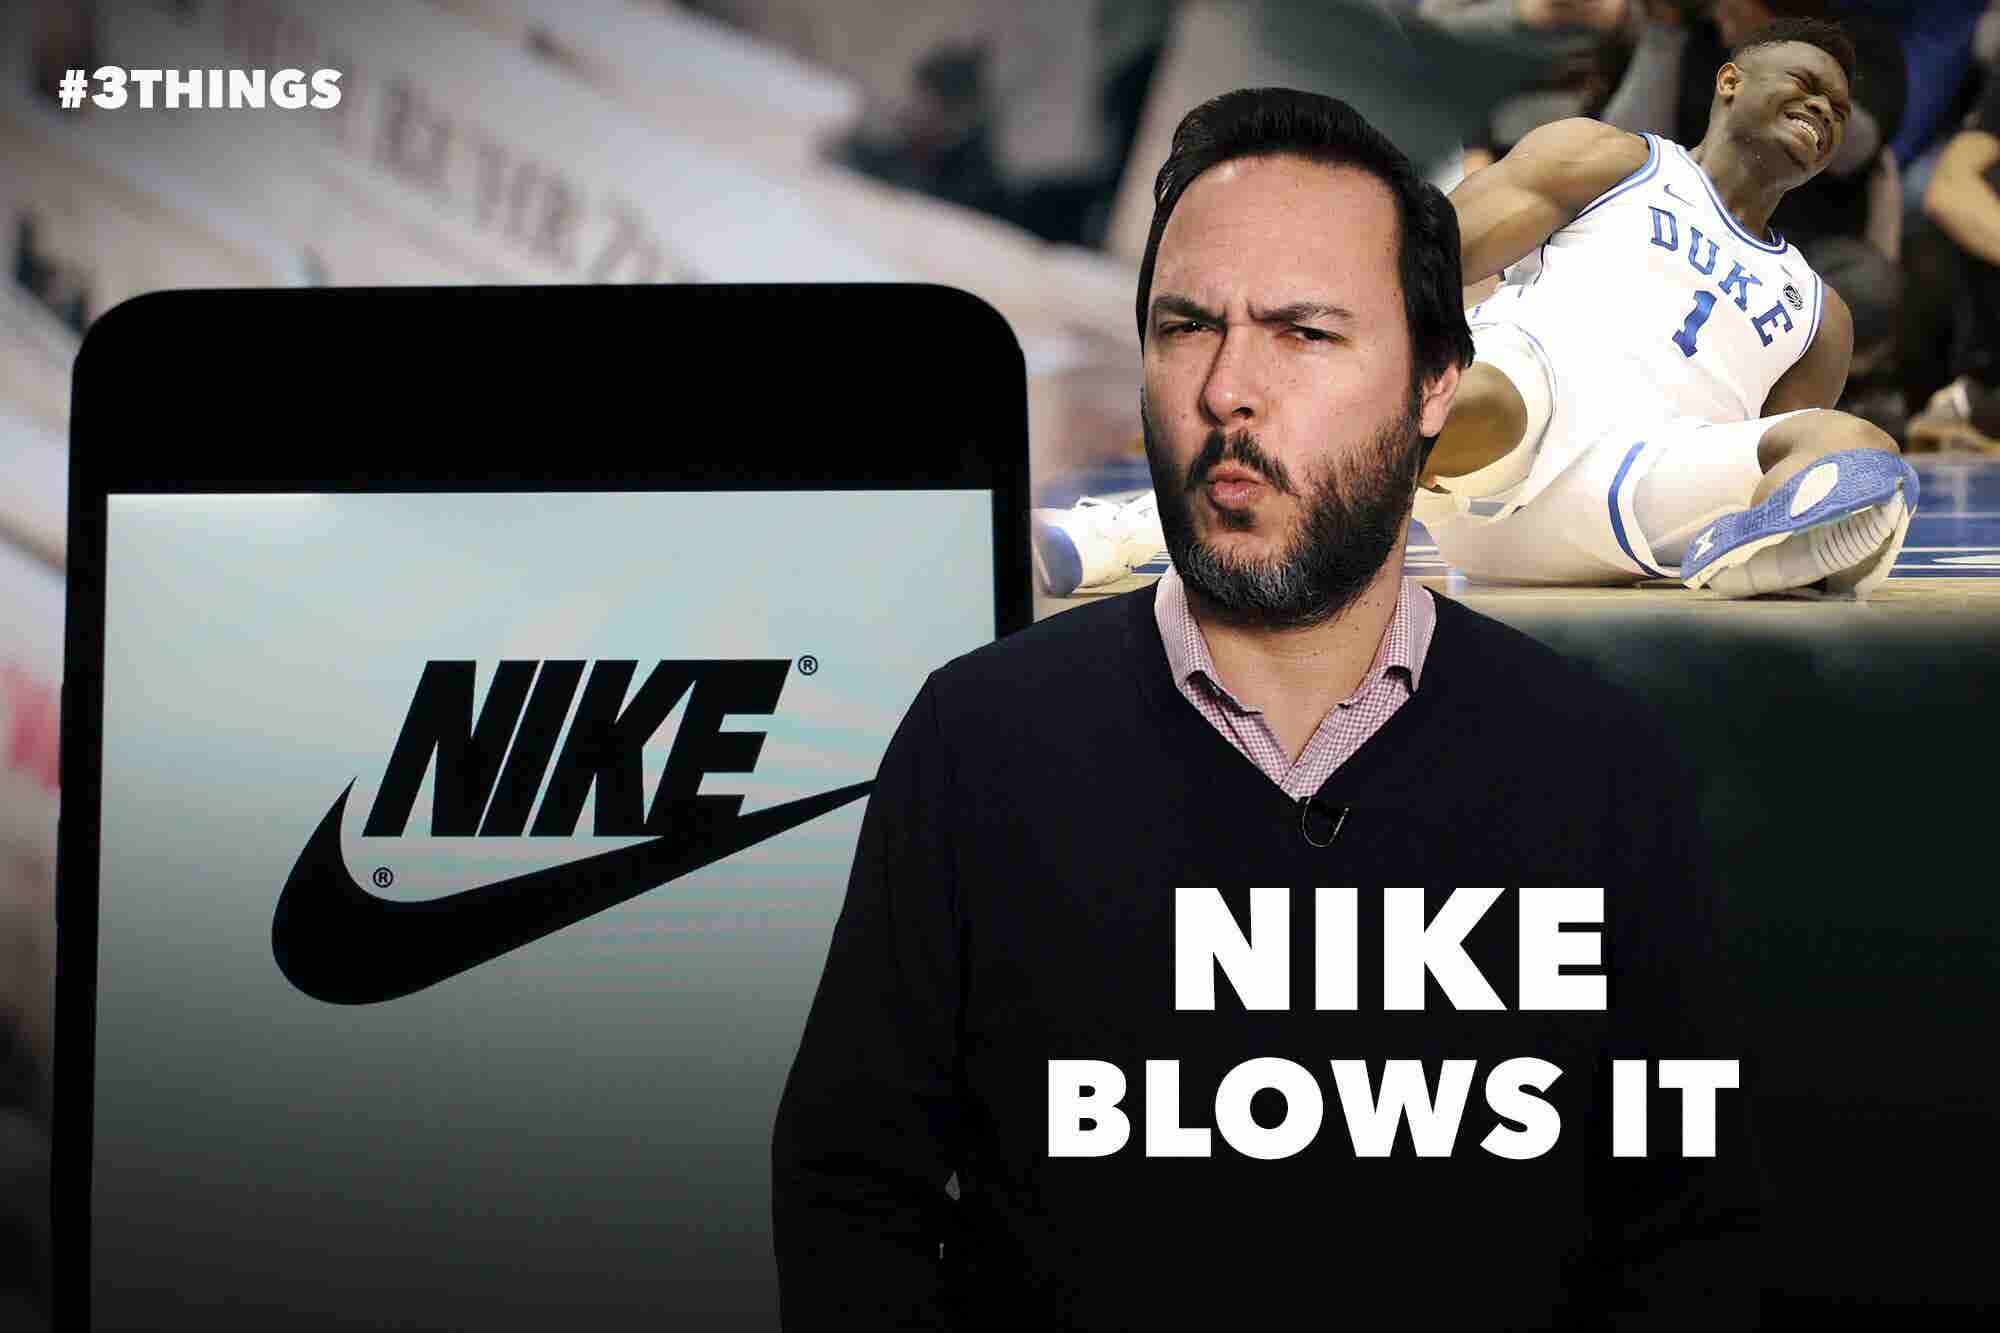 Nike High-Tops Split Open Mid-Game, Injuring Duke Basketball Superstar Zion Williamson (60-Second Video)